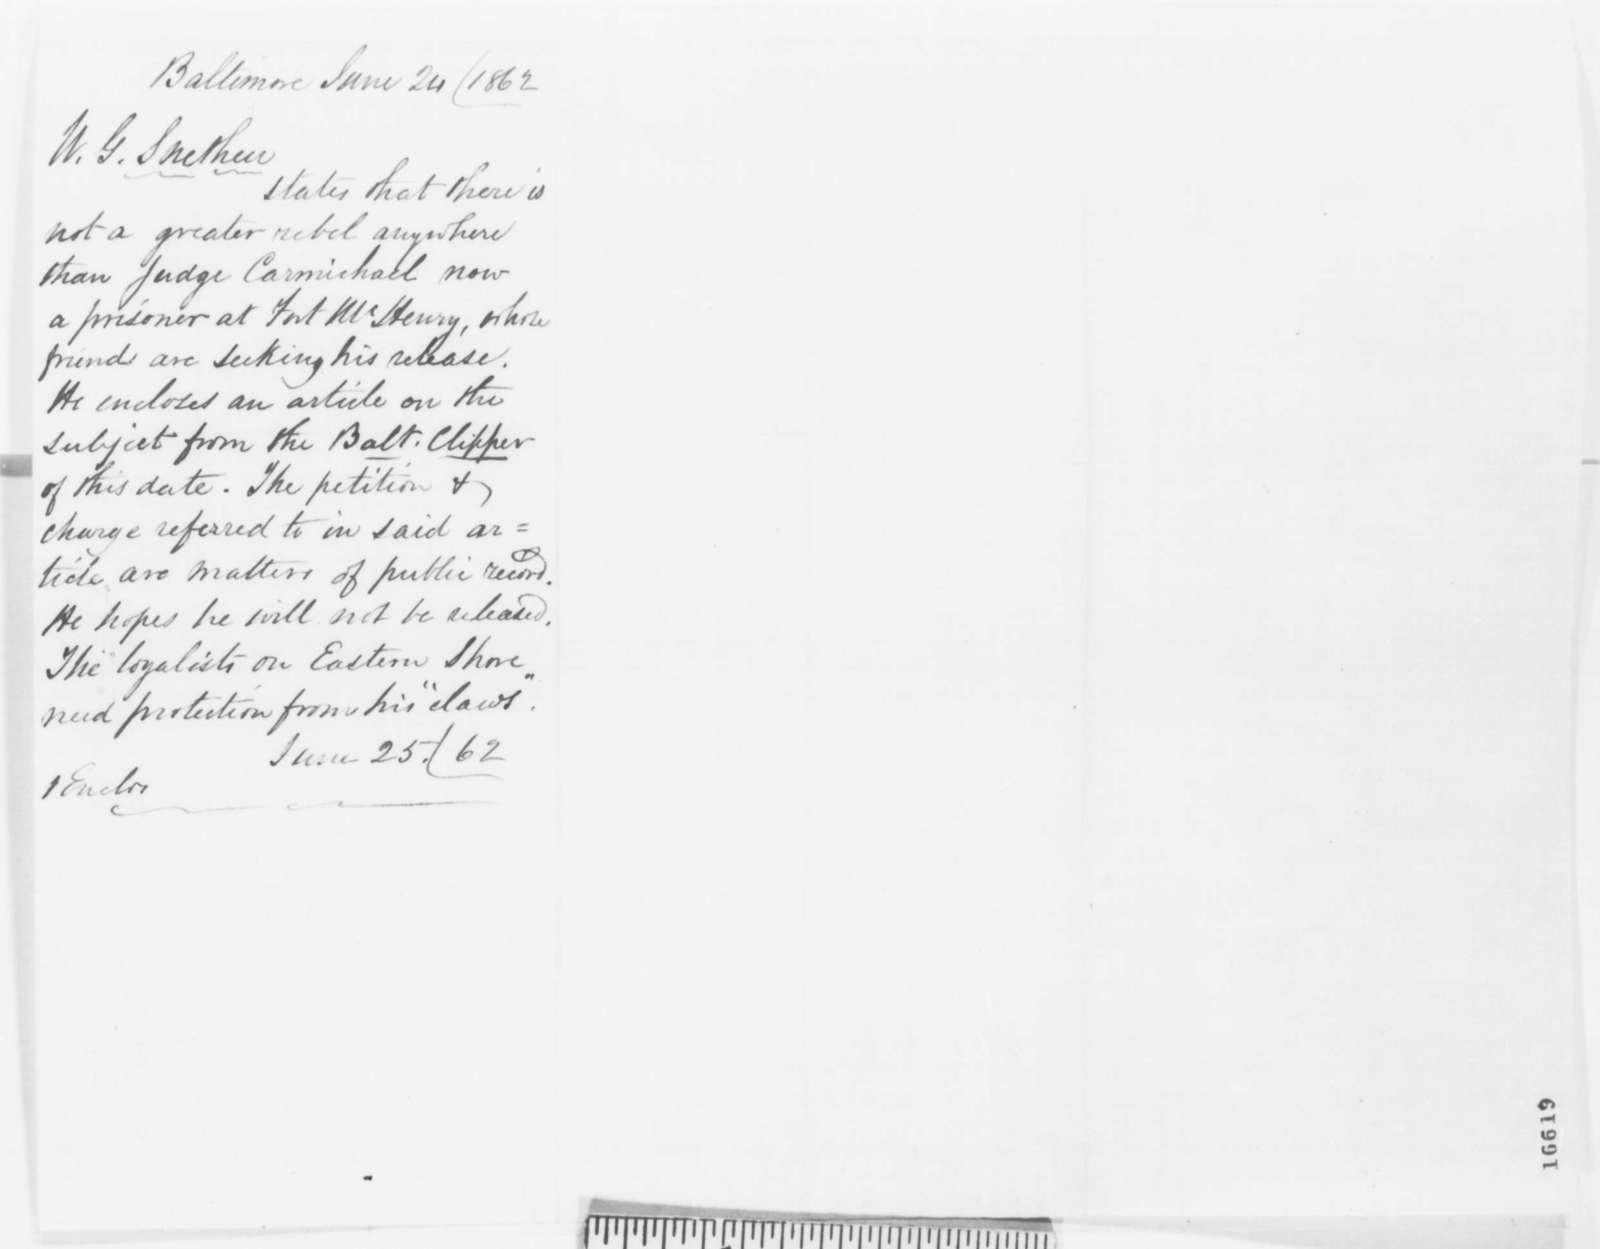 Worthington G. Snethen to Edwin M. Stanton, Tuesday, June 24, 1862  (Opposes release of Judge Carmichael)